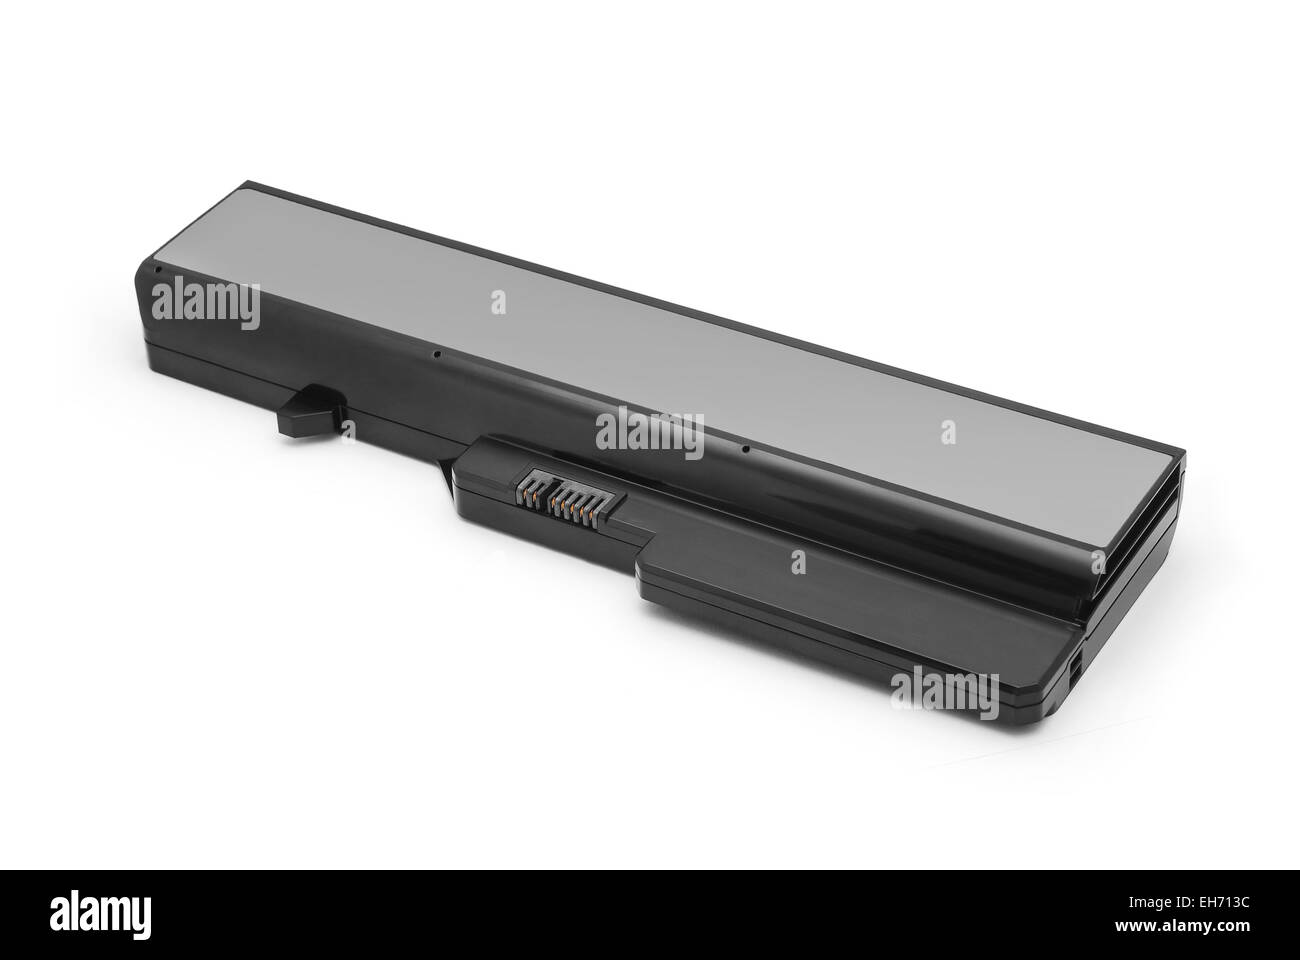 laptop battery isolated on white - Stock Image